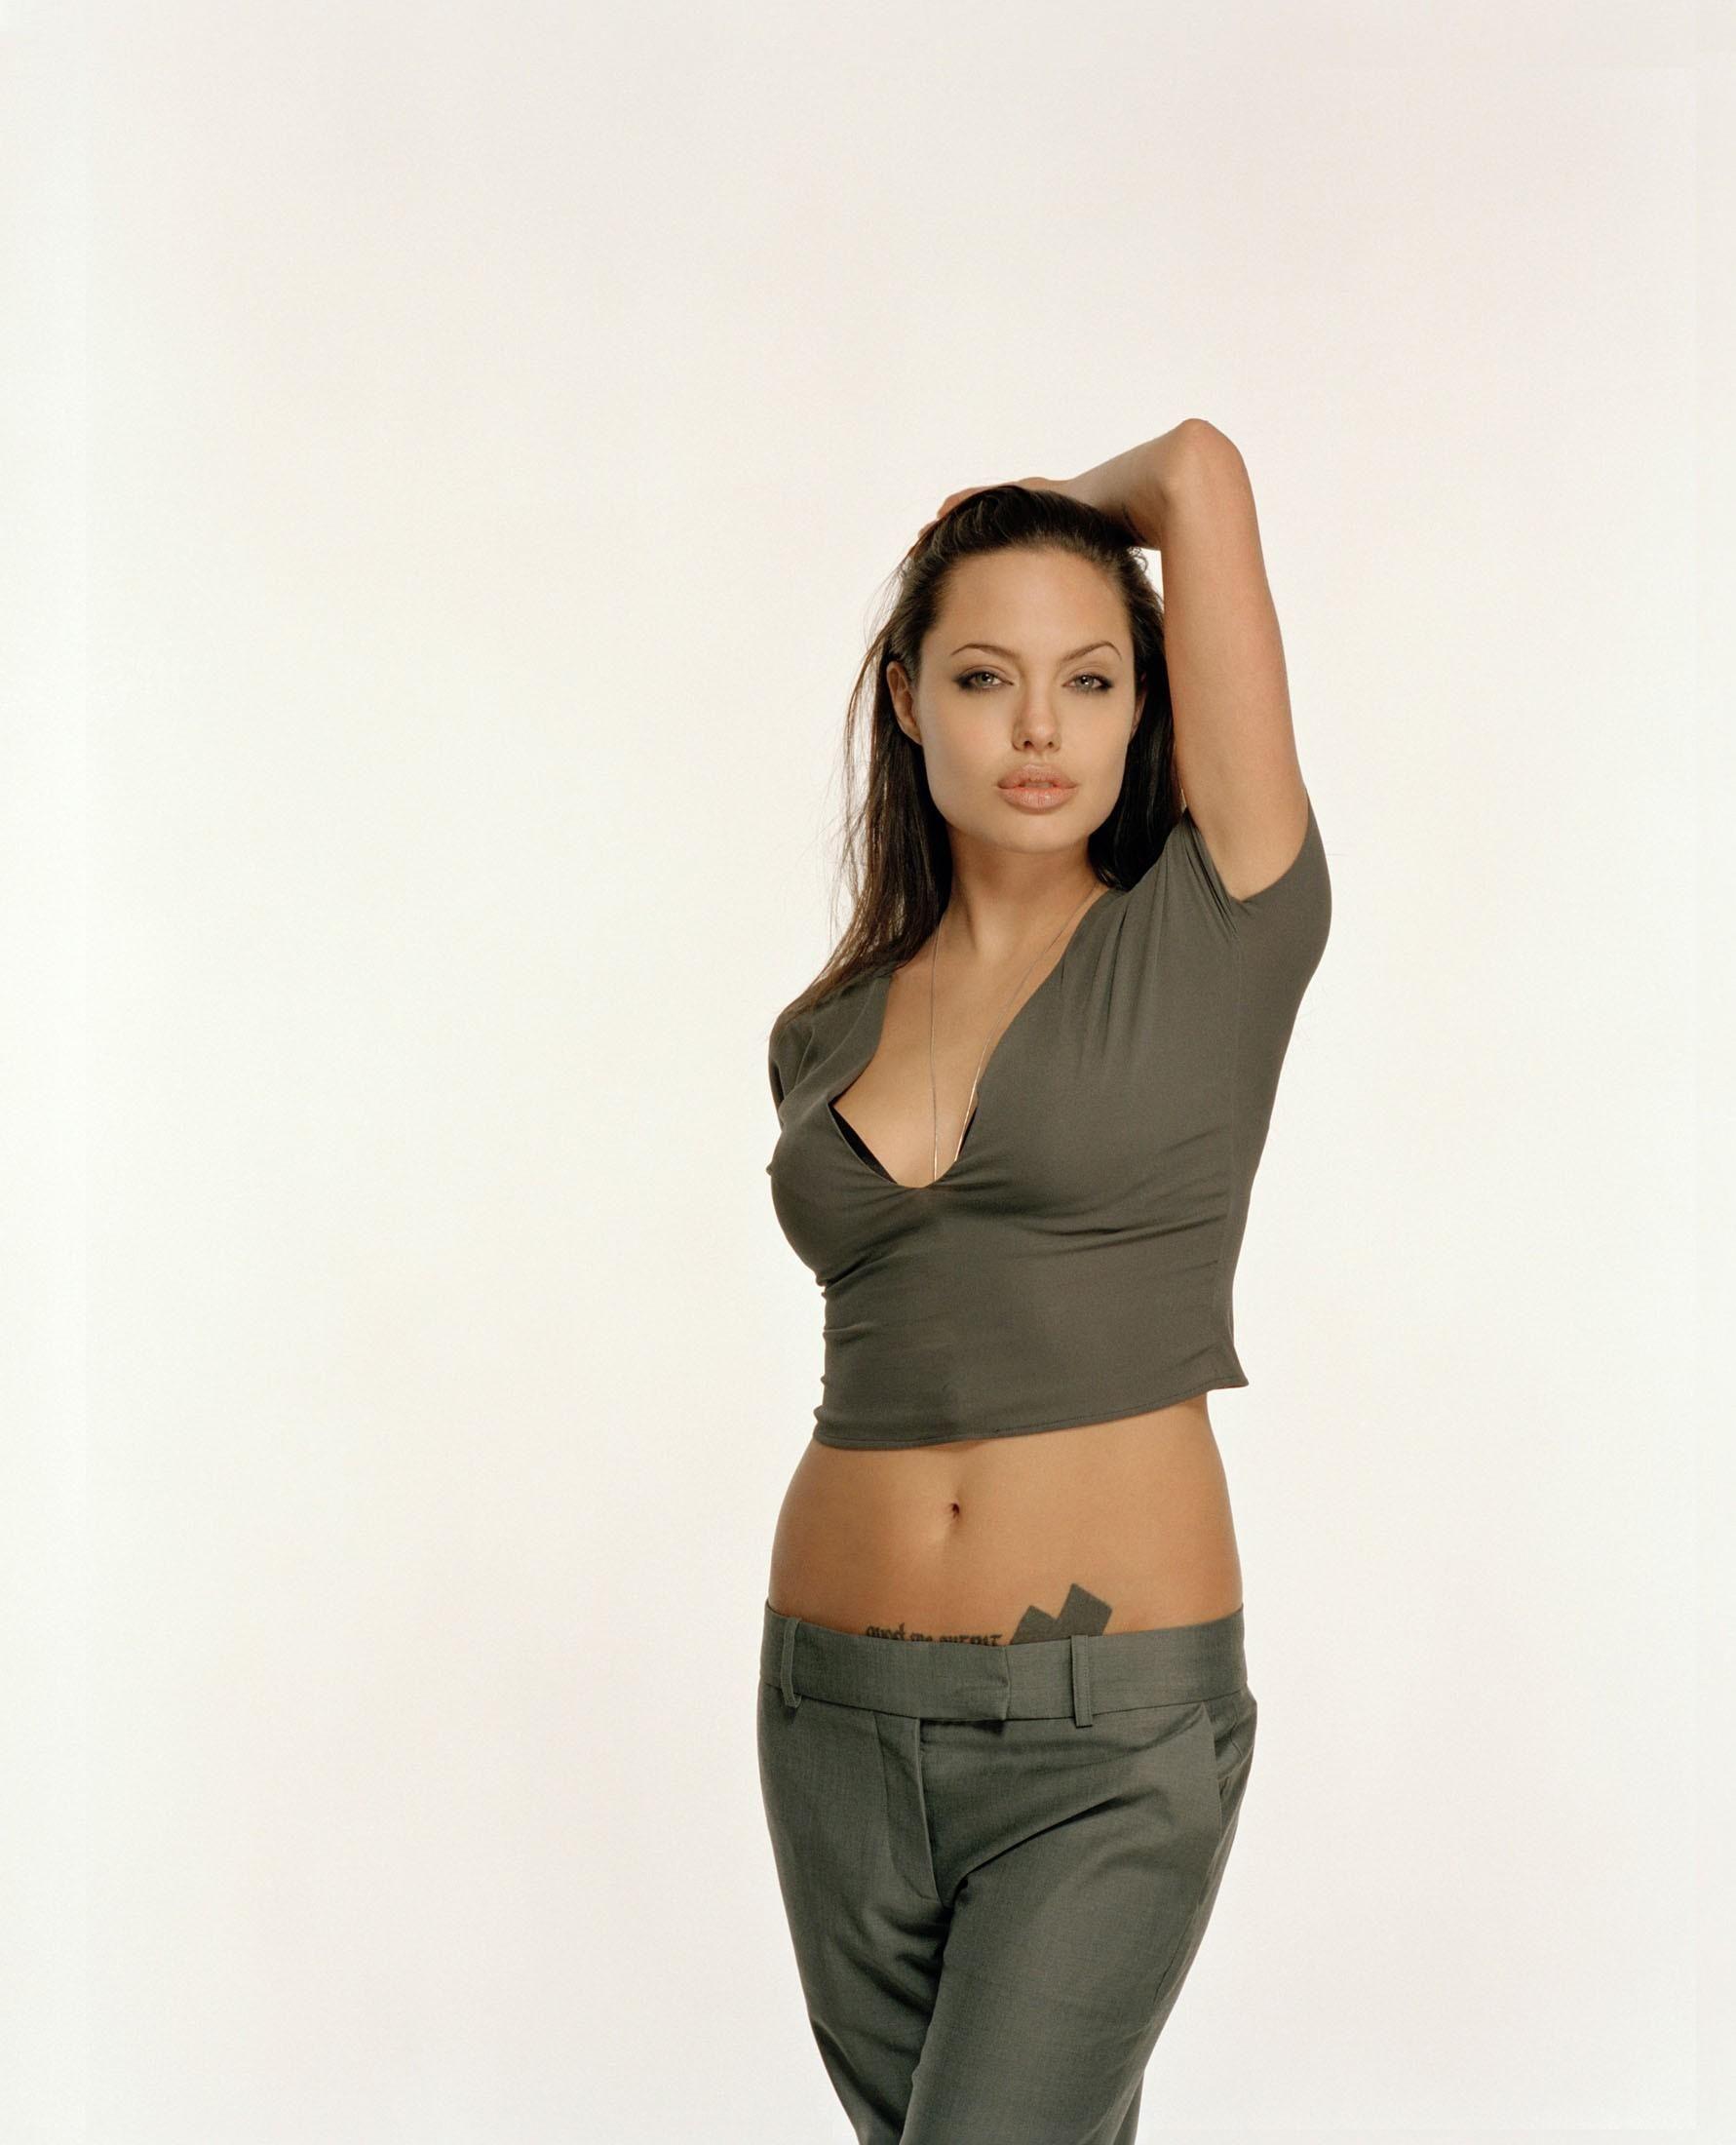 анджелина джоли Angelina Jolie в фотосессии фируза захеди Firooz